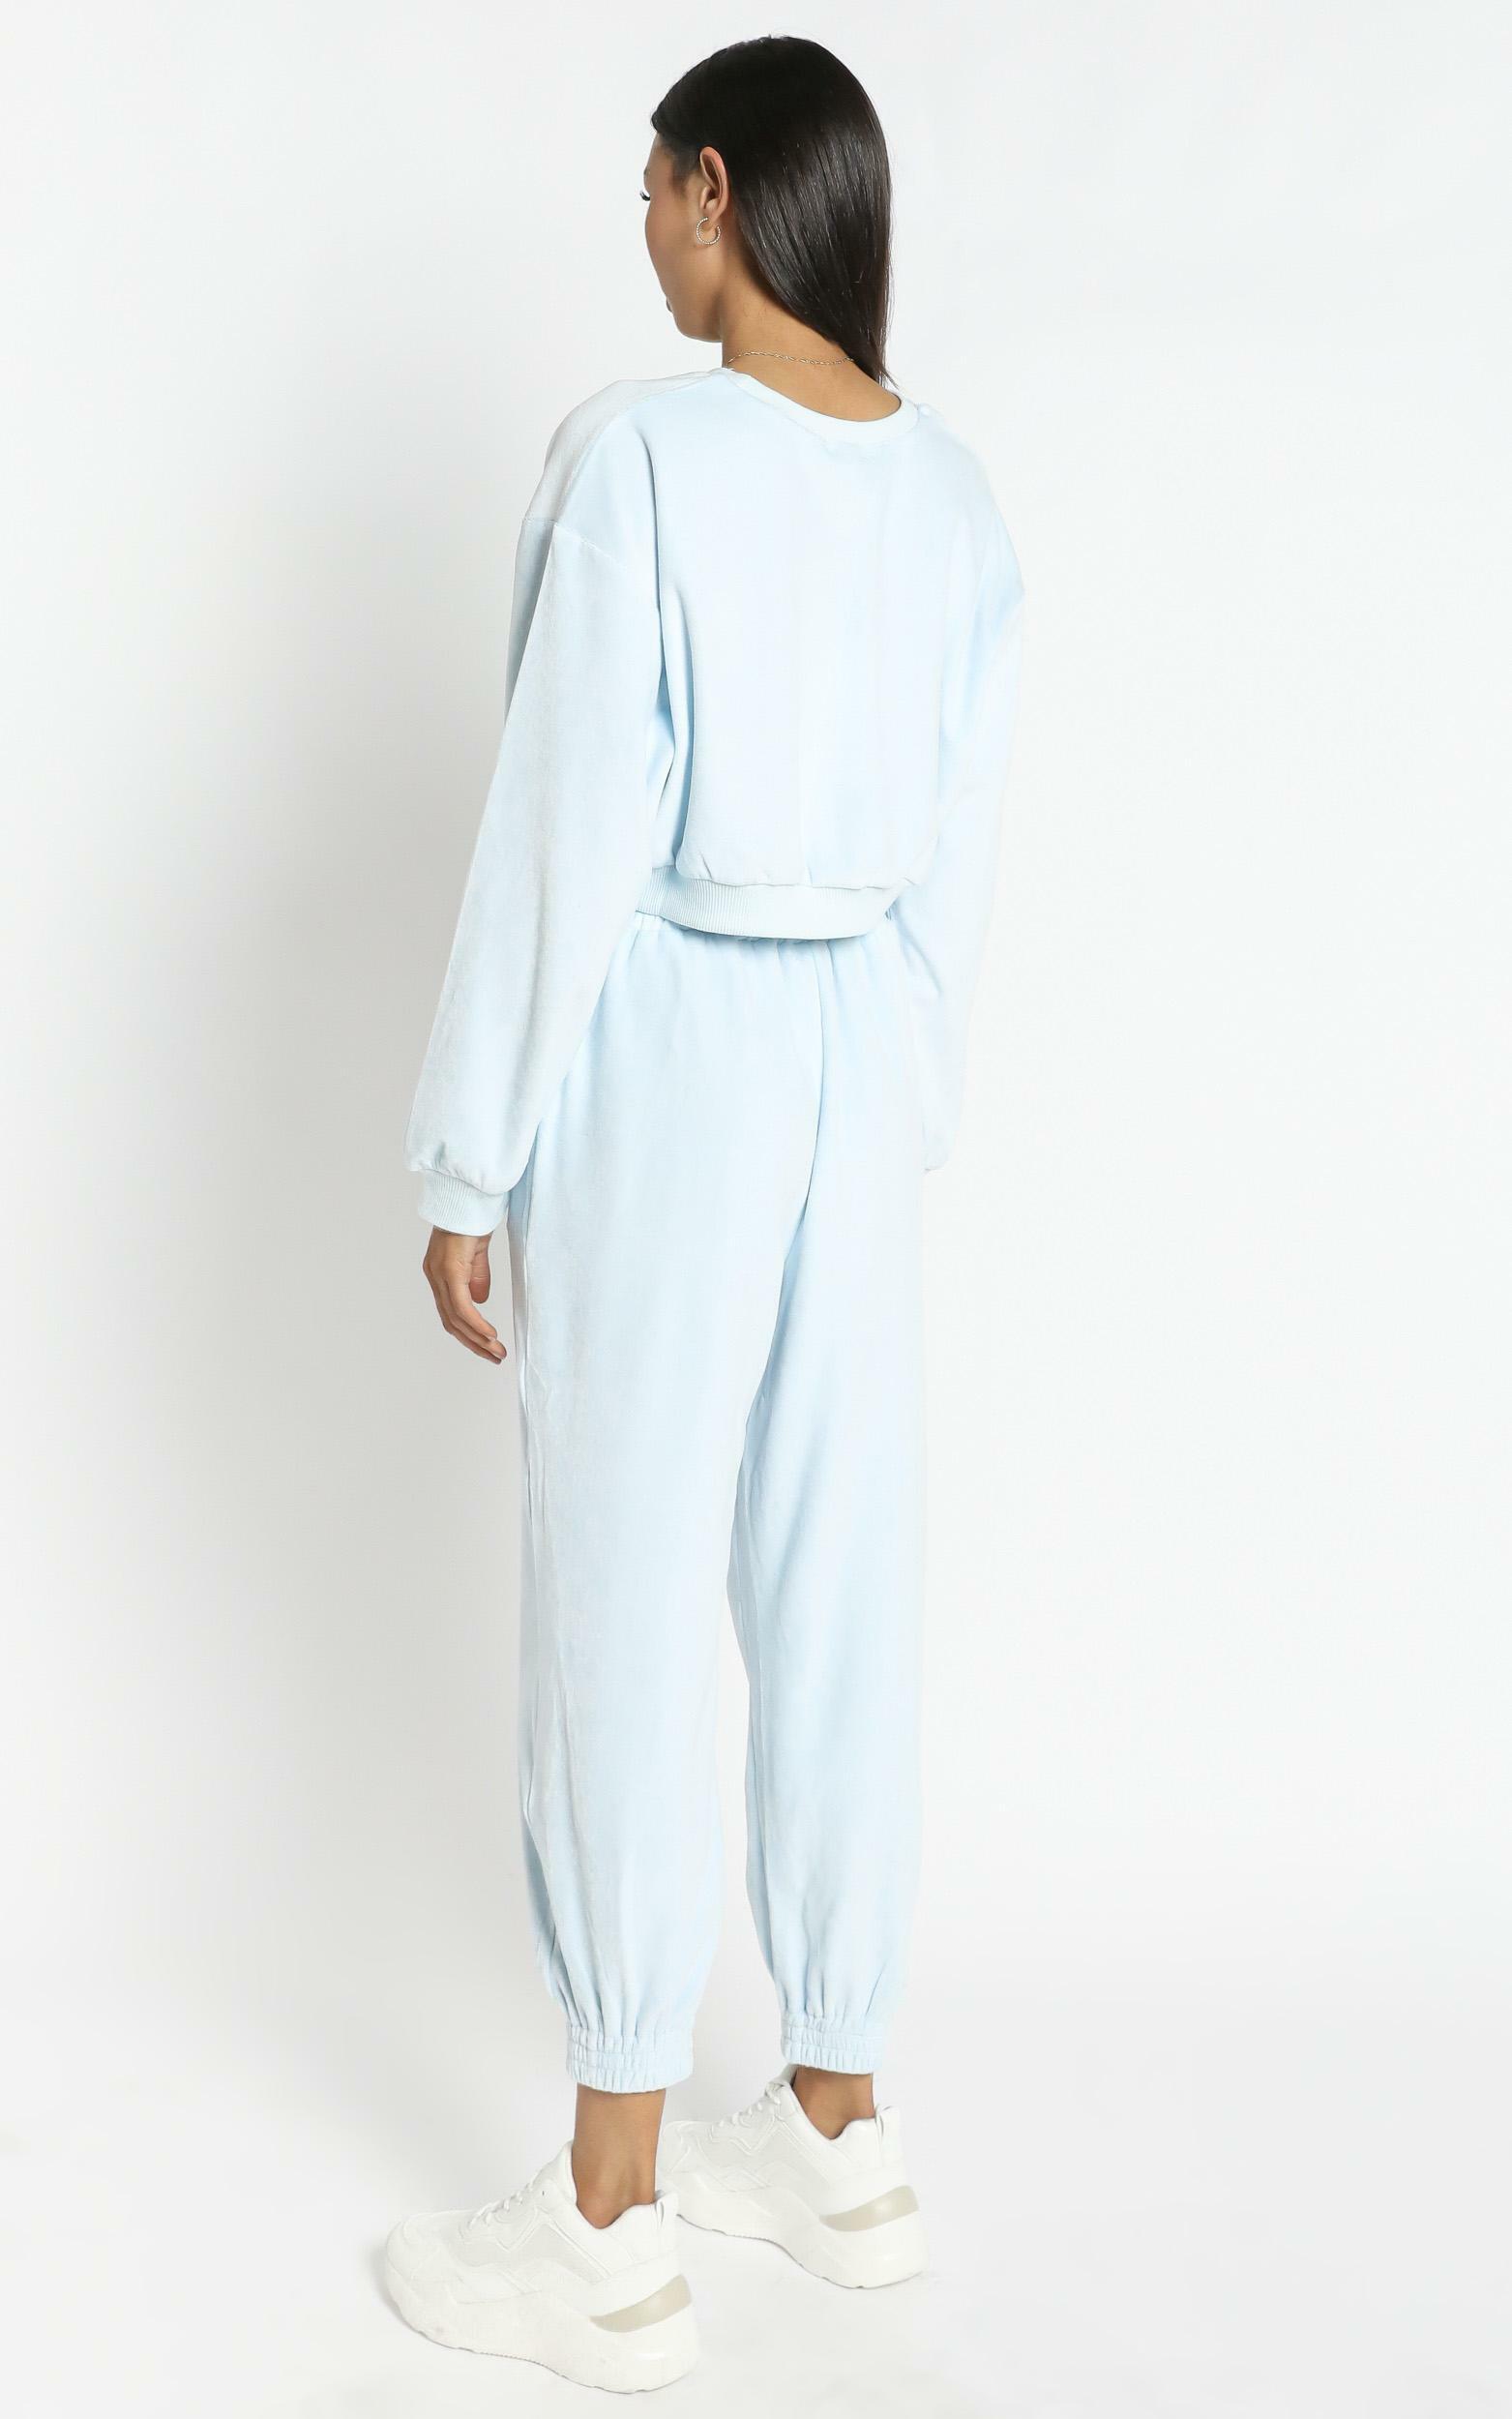 Merrick Sweat Pants in Pastel Blue - 12 (L), Blue, hi-res image number null